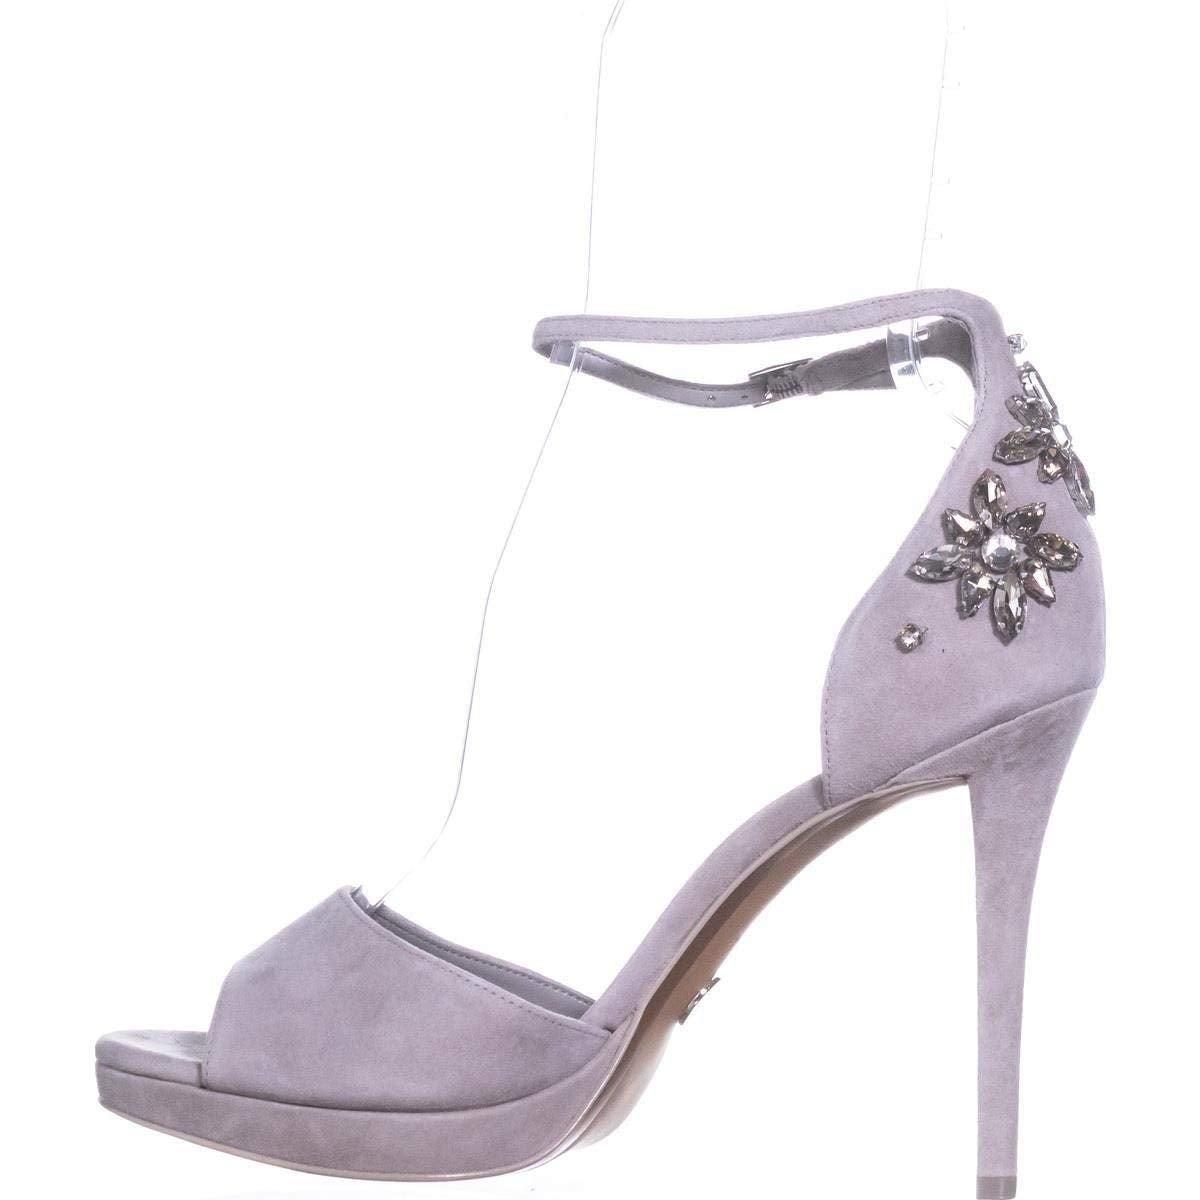 4c9e7963c00e Shop MICHAEL Michael Kors Women s Patti Jeweled Platform Sandal - Free  Shipping Today - Overstock - 25596845